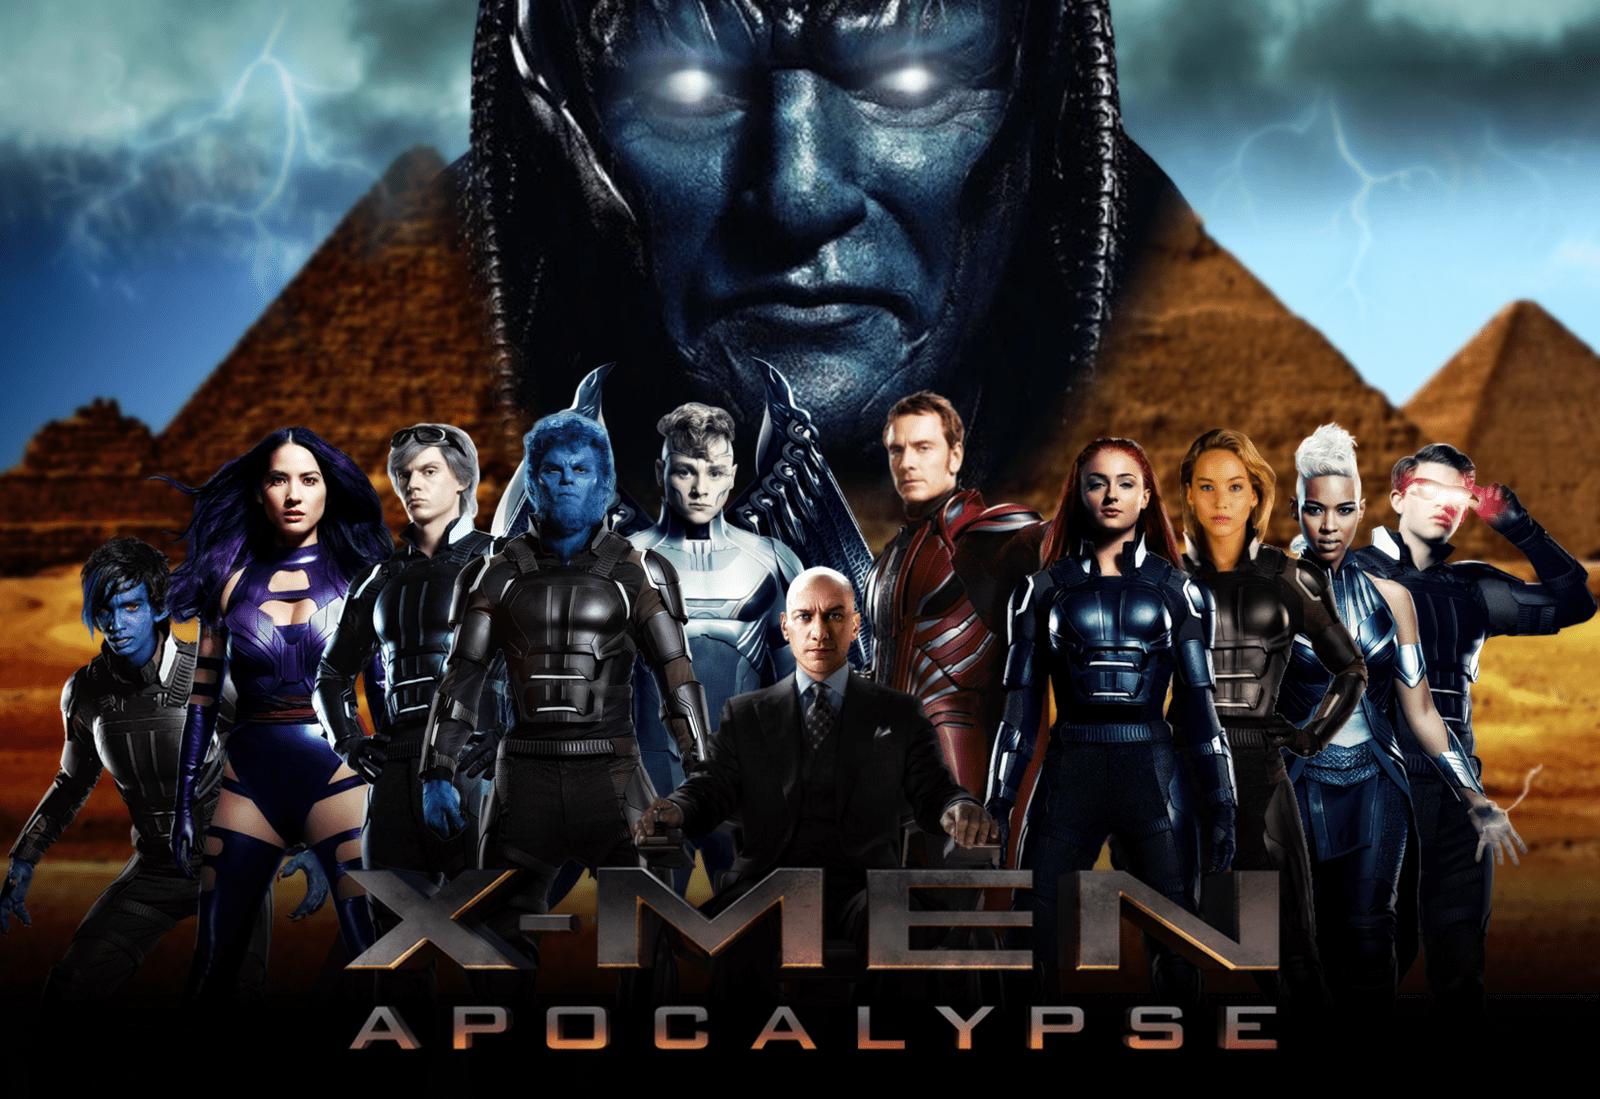 X Men Apocalypse Wallpapers Top Free X Men Apocalypse